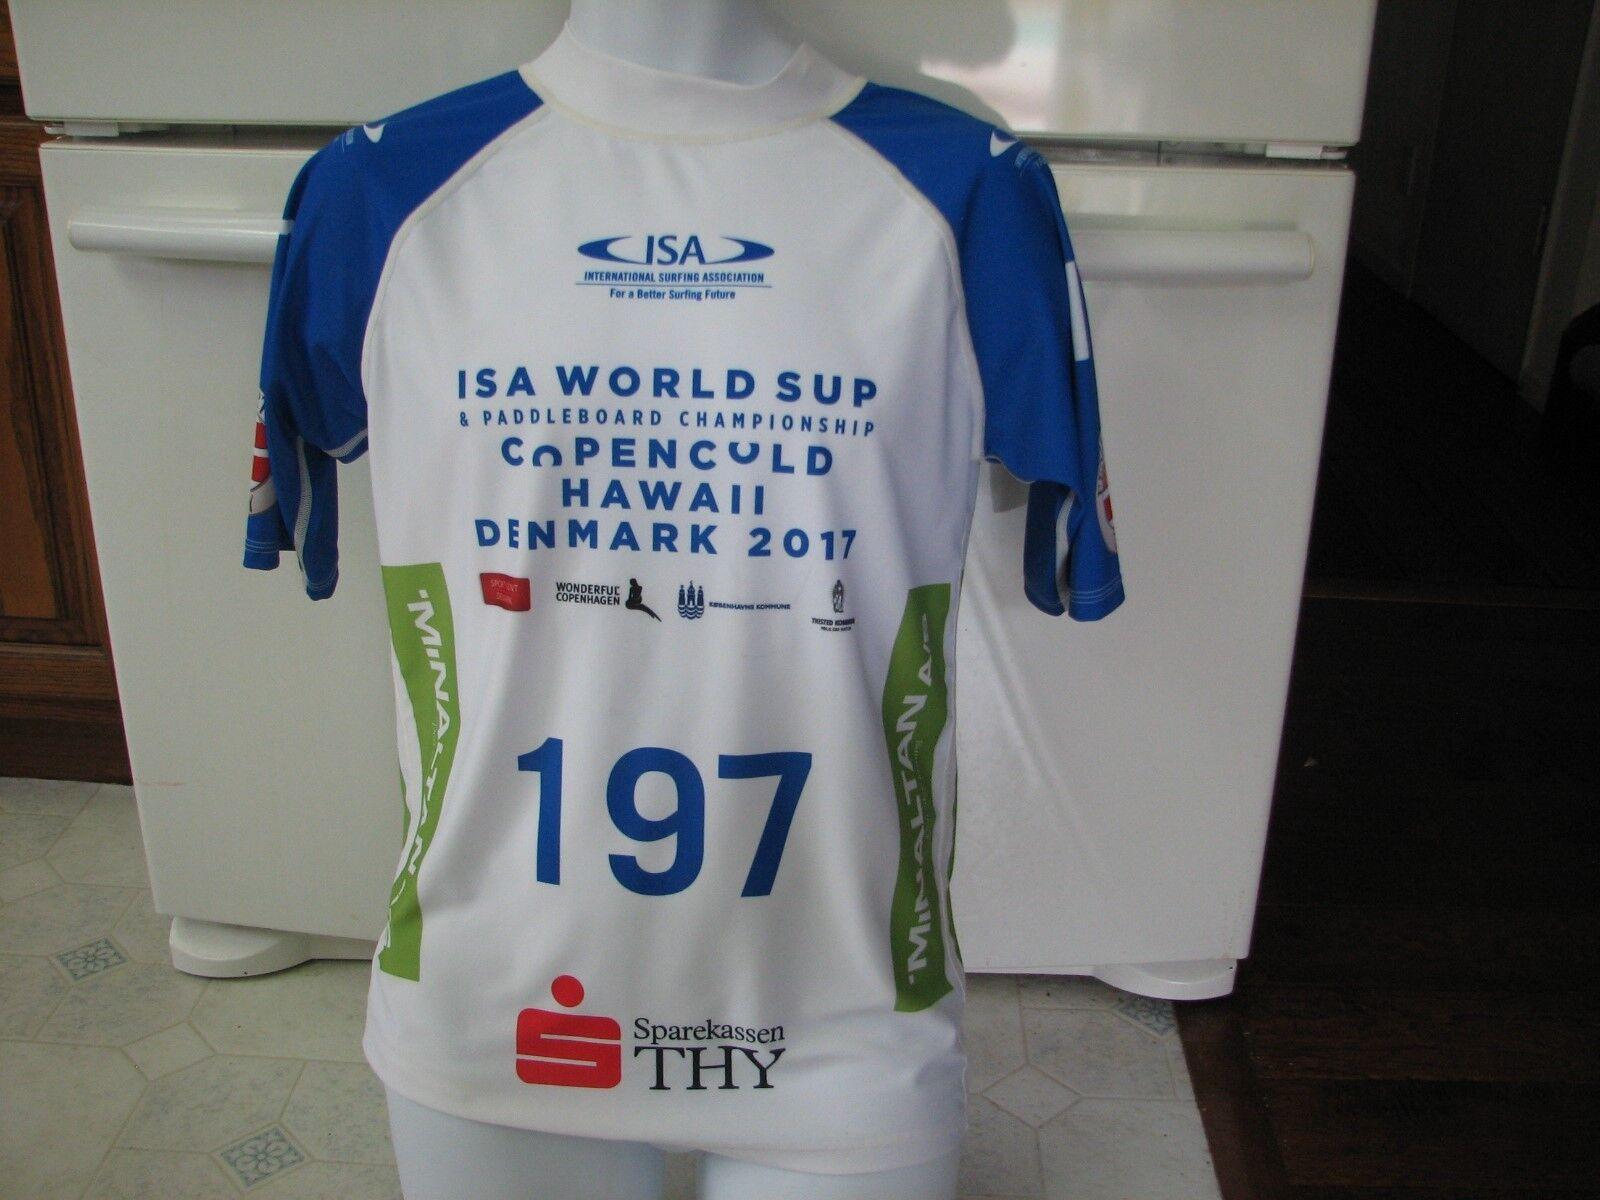 Intl Surfing Association XL rash guard SUP paddleboard contestant Denmark